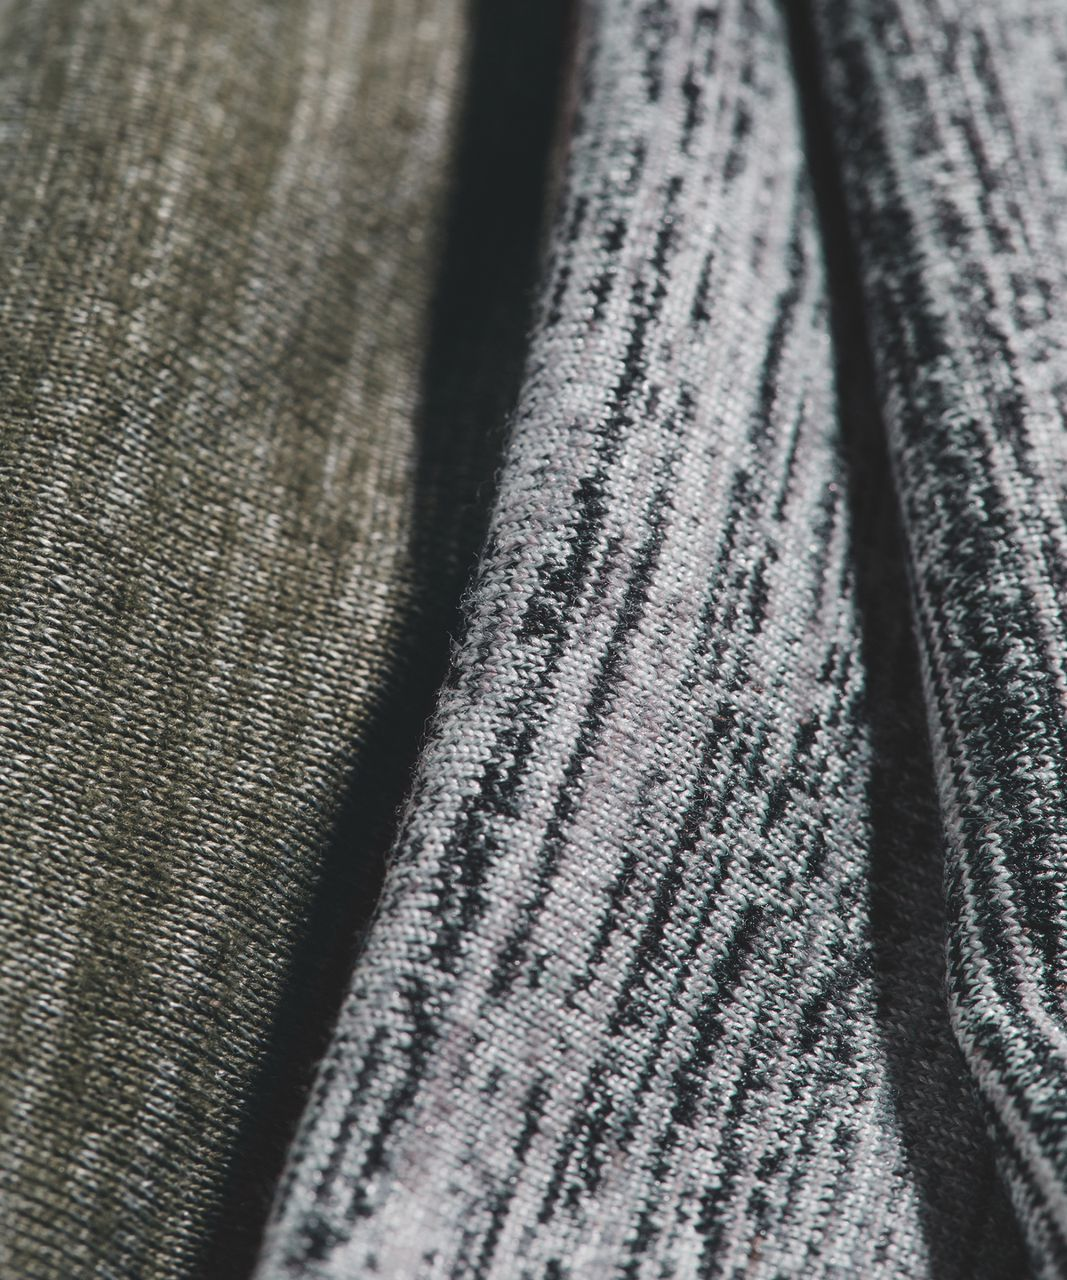 Lululemon Fringe Fighter Headband - Space Dye Camo Seal Grey Deep Coal / Heathered Fatigue Green